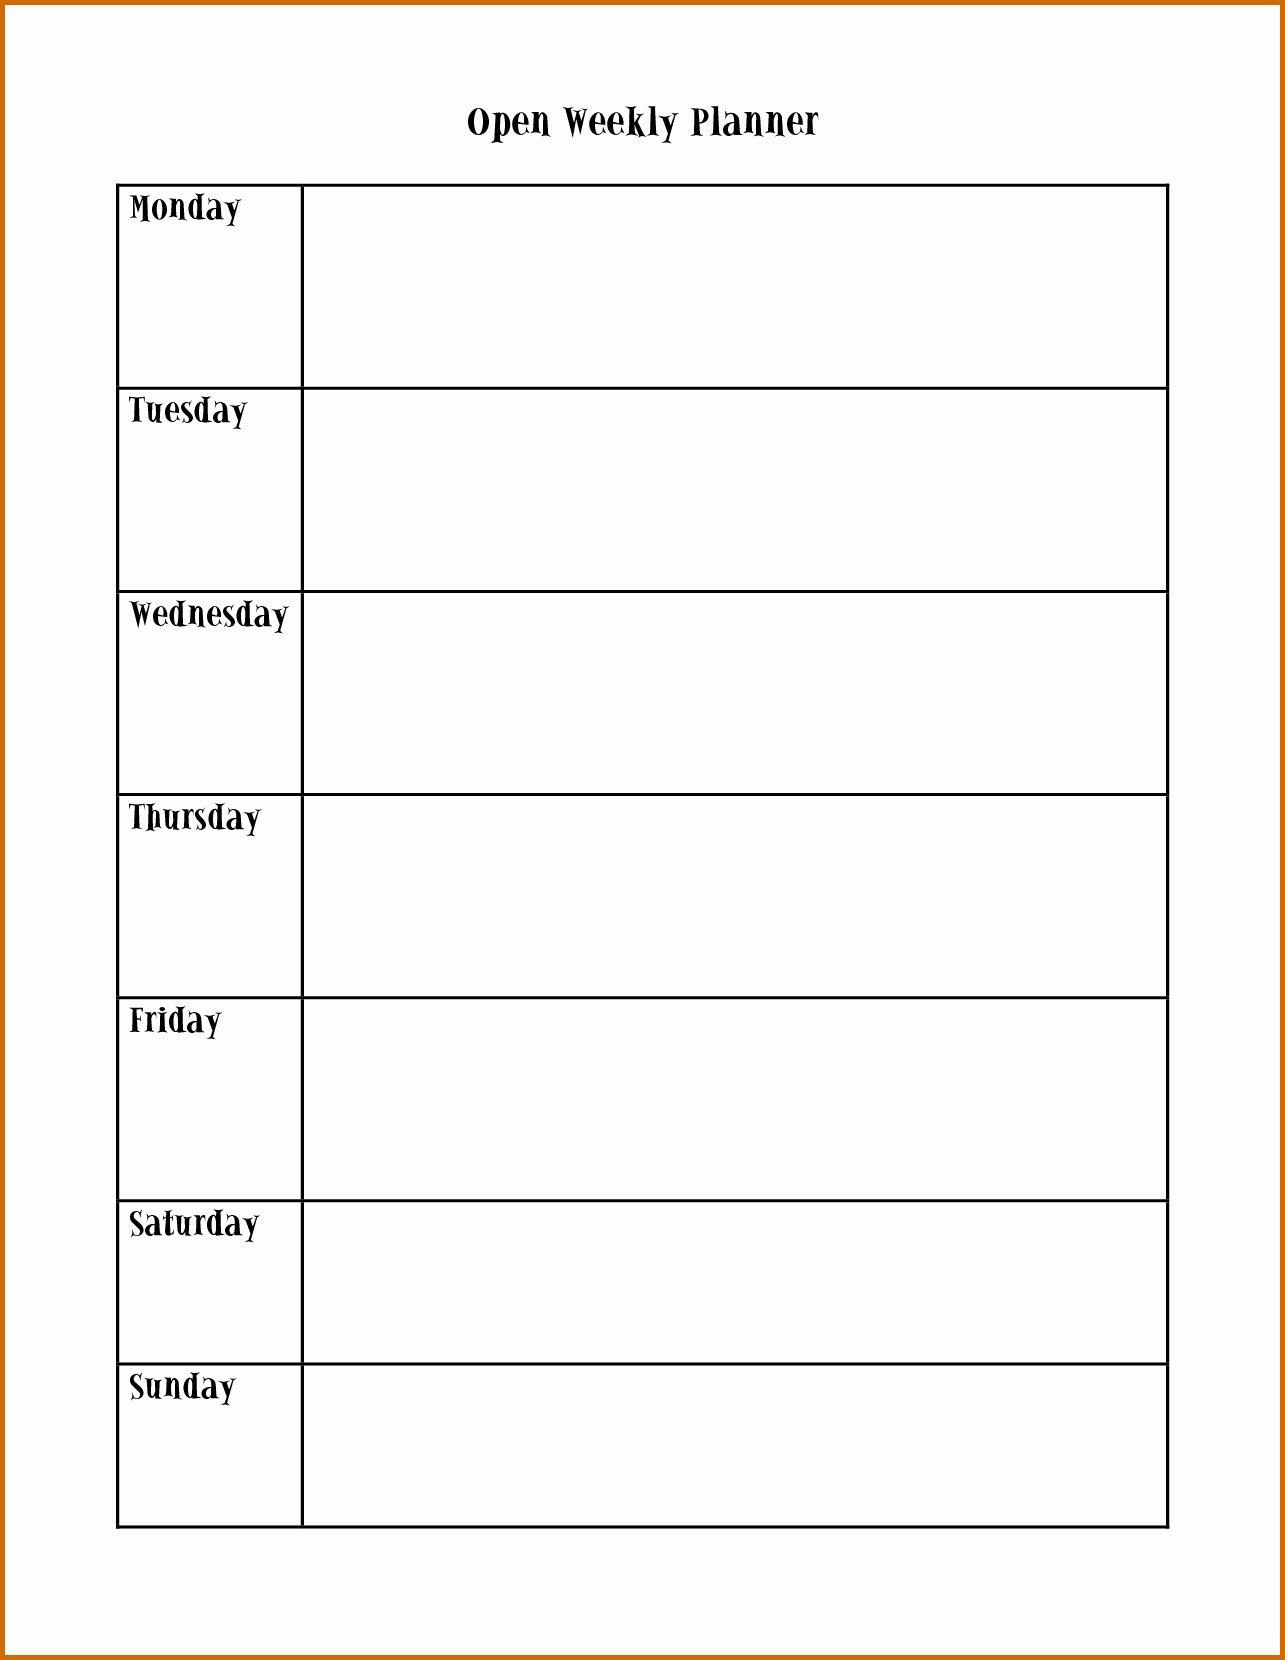 Image Result For Blank Calendar Page Monday Through Sunday Free Printable Monday Thru Sunday Calendars